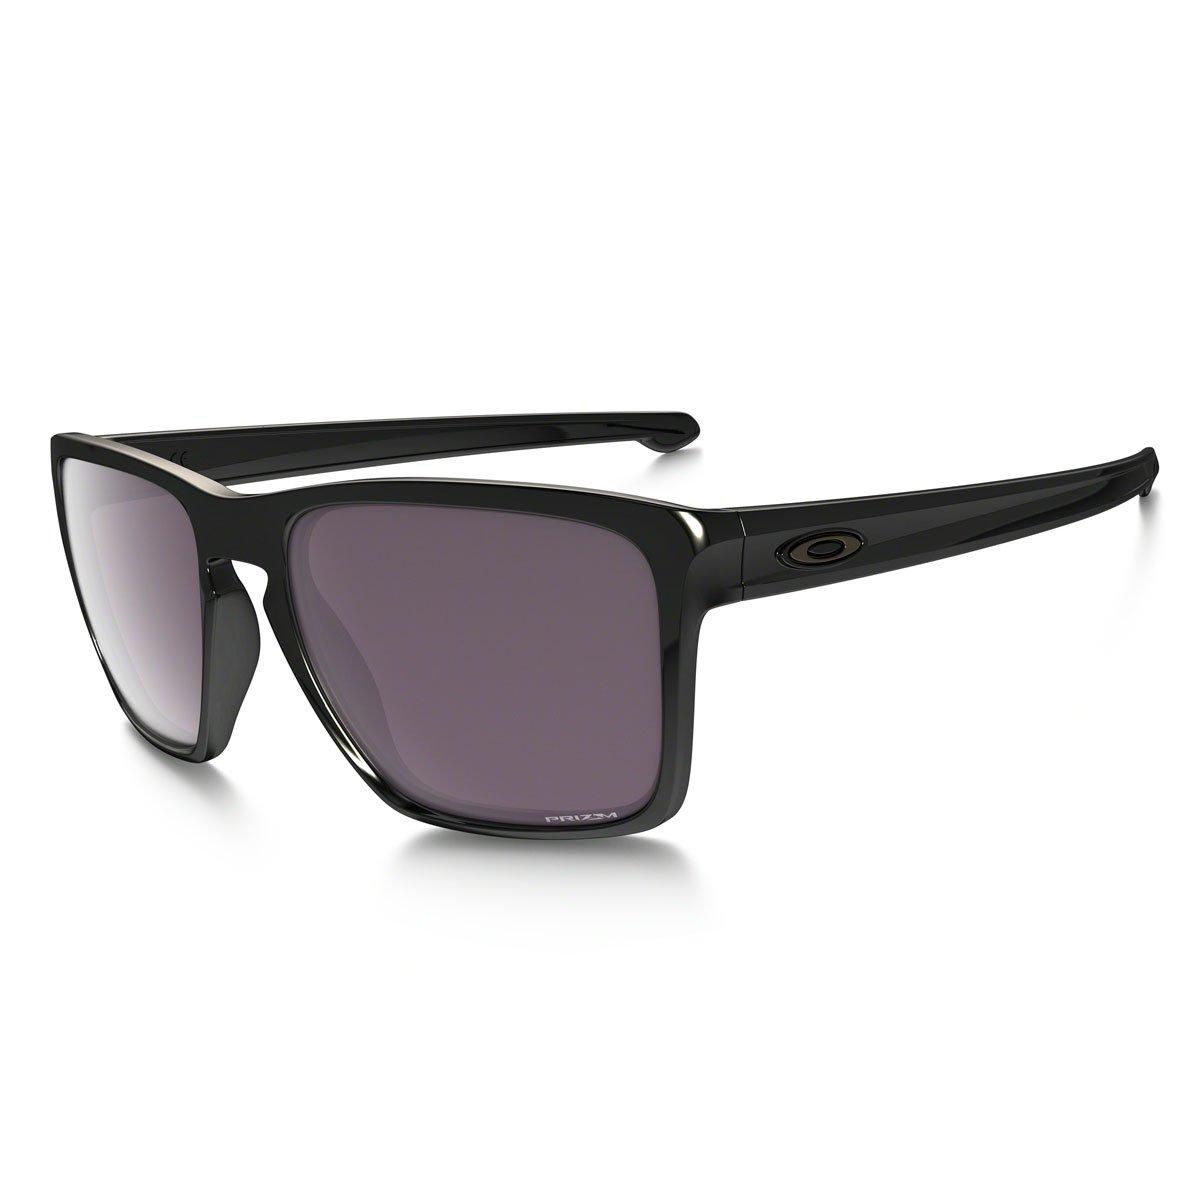 Óculos Oakley Sliver XL Polished Black   Prizm Daily Polarized ... bc5db1c579